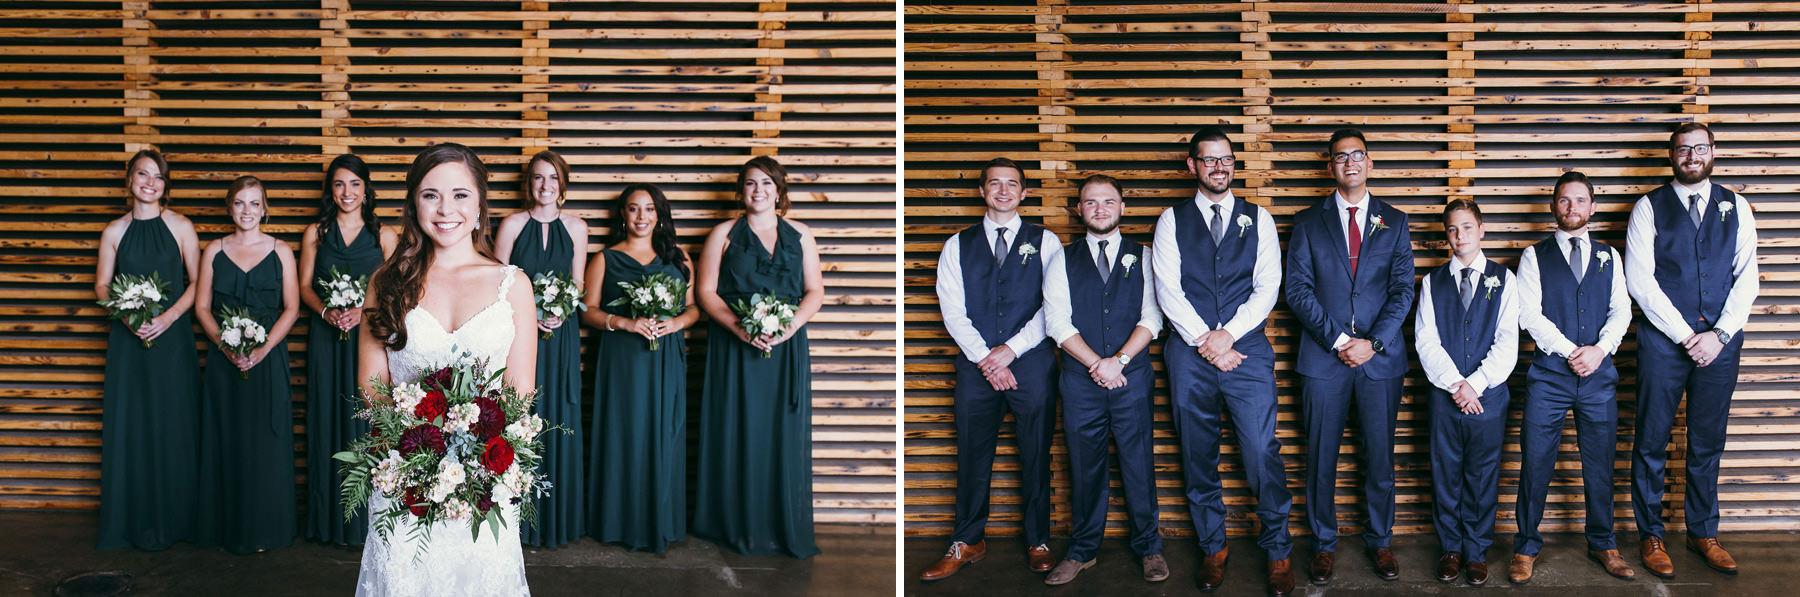 Kansas City Summer Wedding at the Guild_Kindling Wedding Photography Blog34.JPG